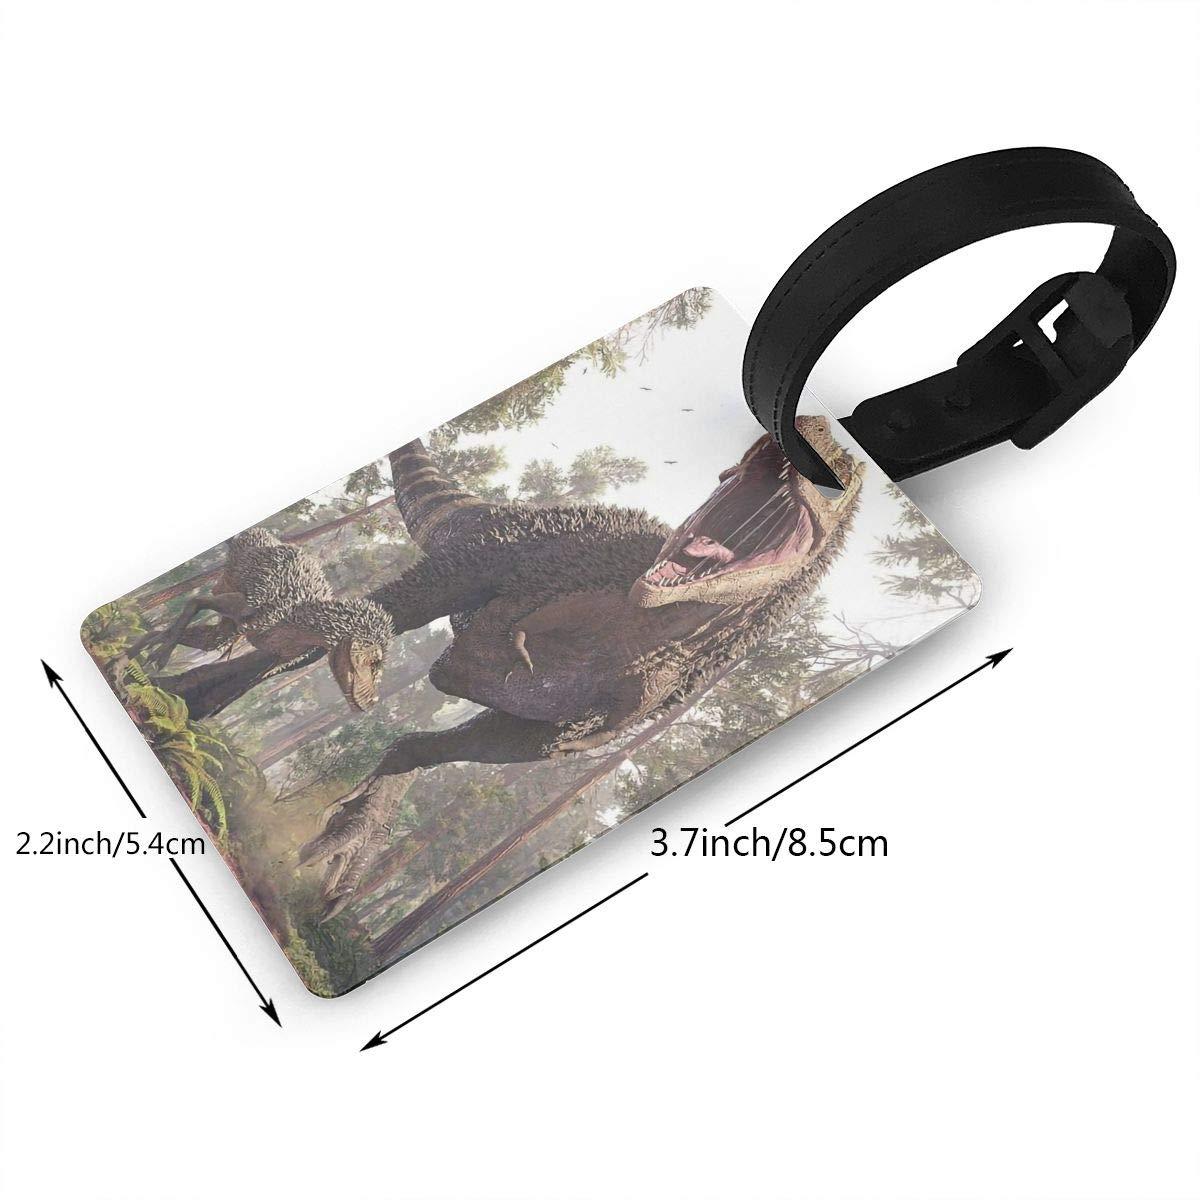 2 Pack Luggage Tags Dinosaur Handbag Tag For Travel Tags Accessories